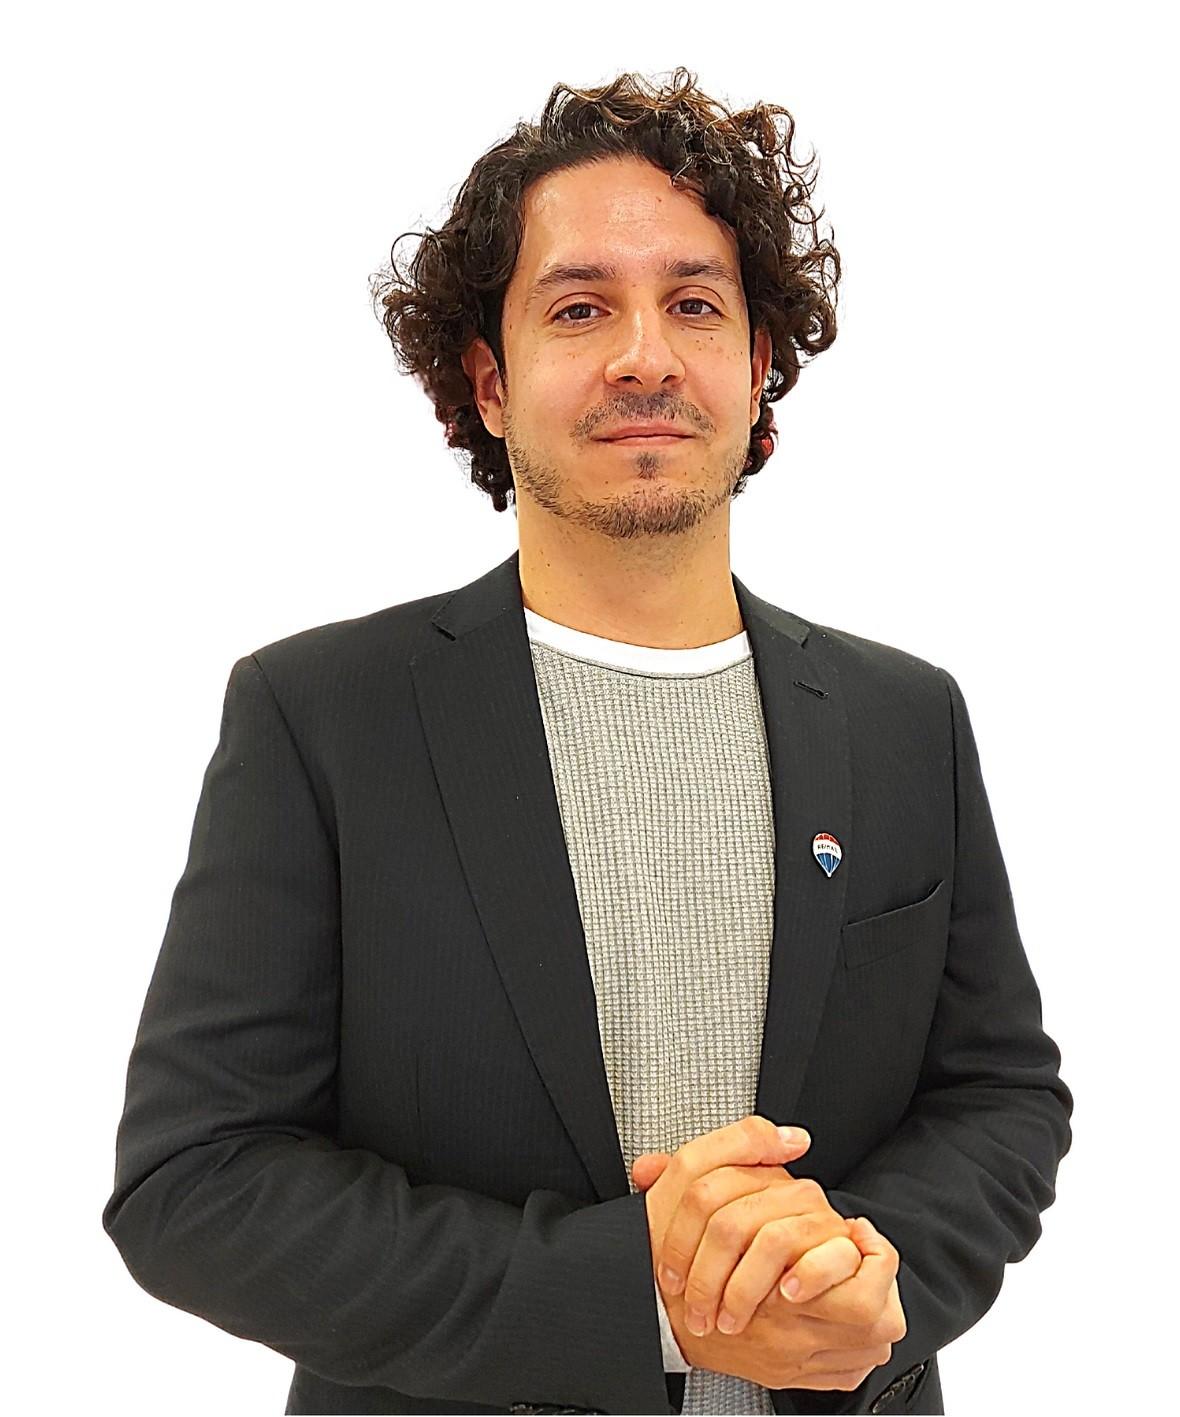 Rubén José Salvador Fernández